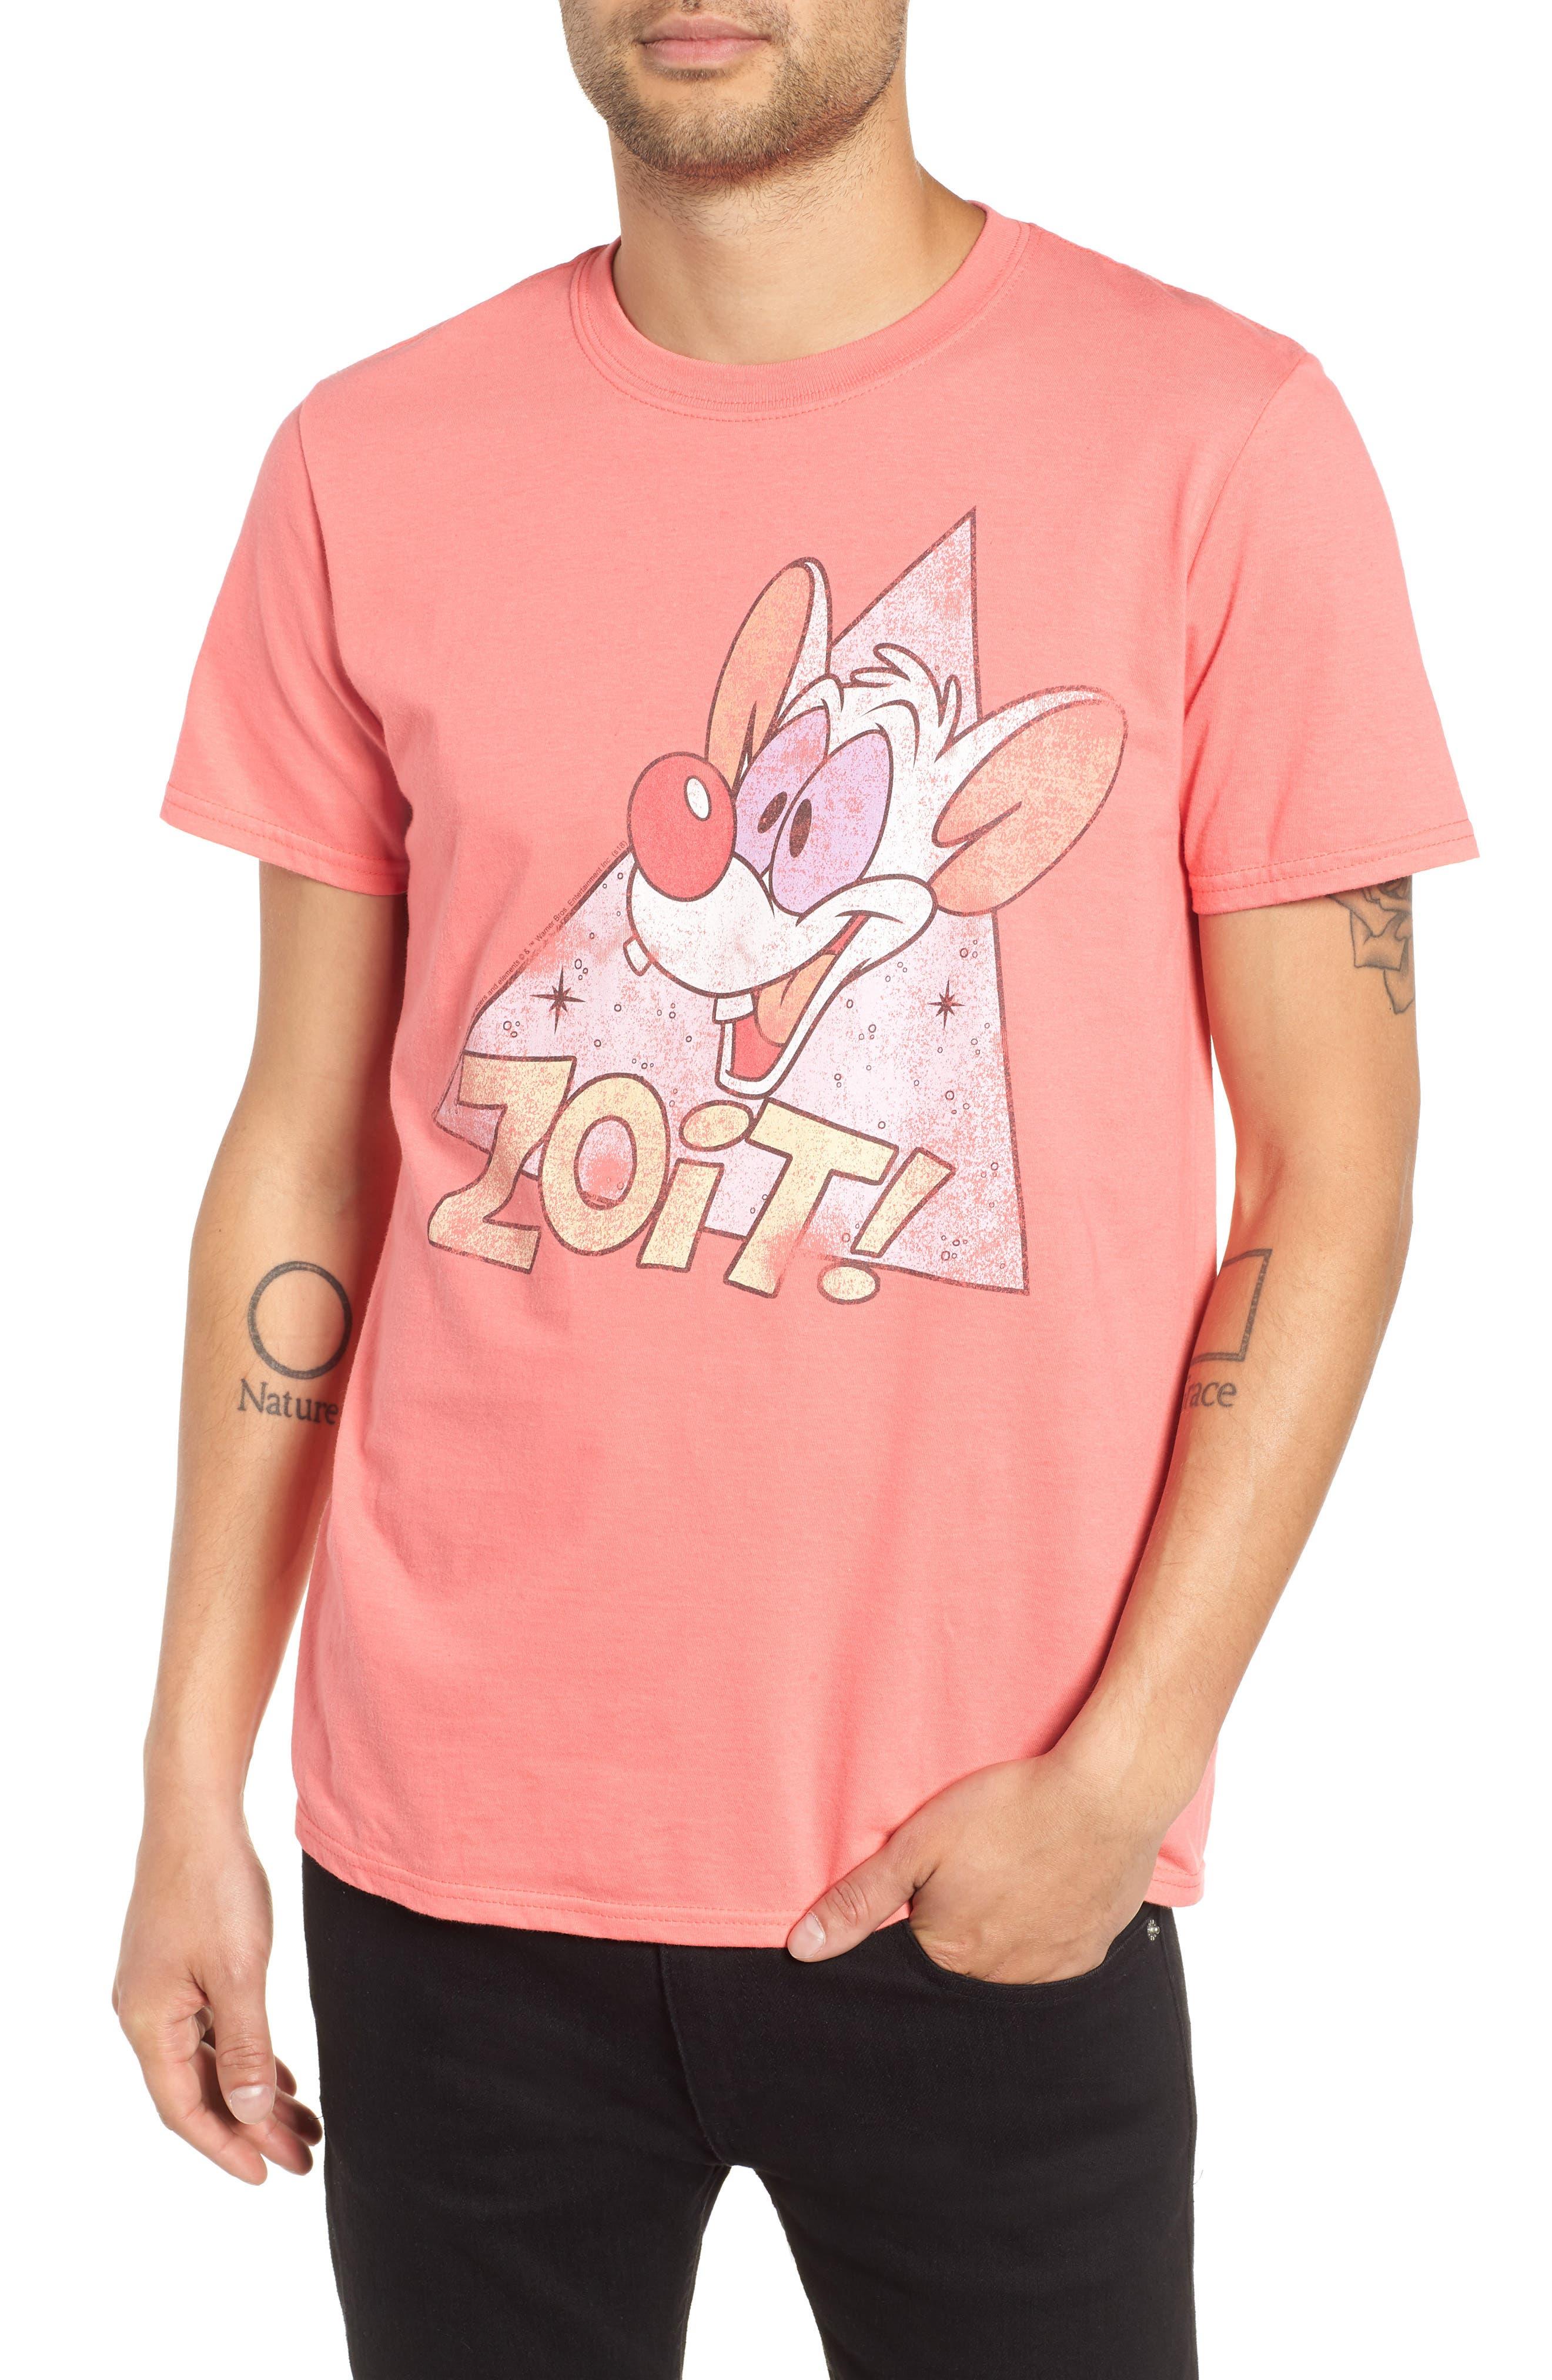 Zoit Graphic T-Shirt,                         Main,                         color, CORAL ZOIT